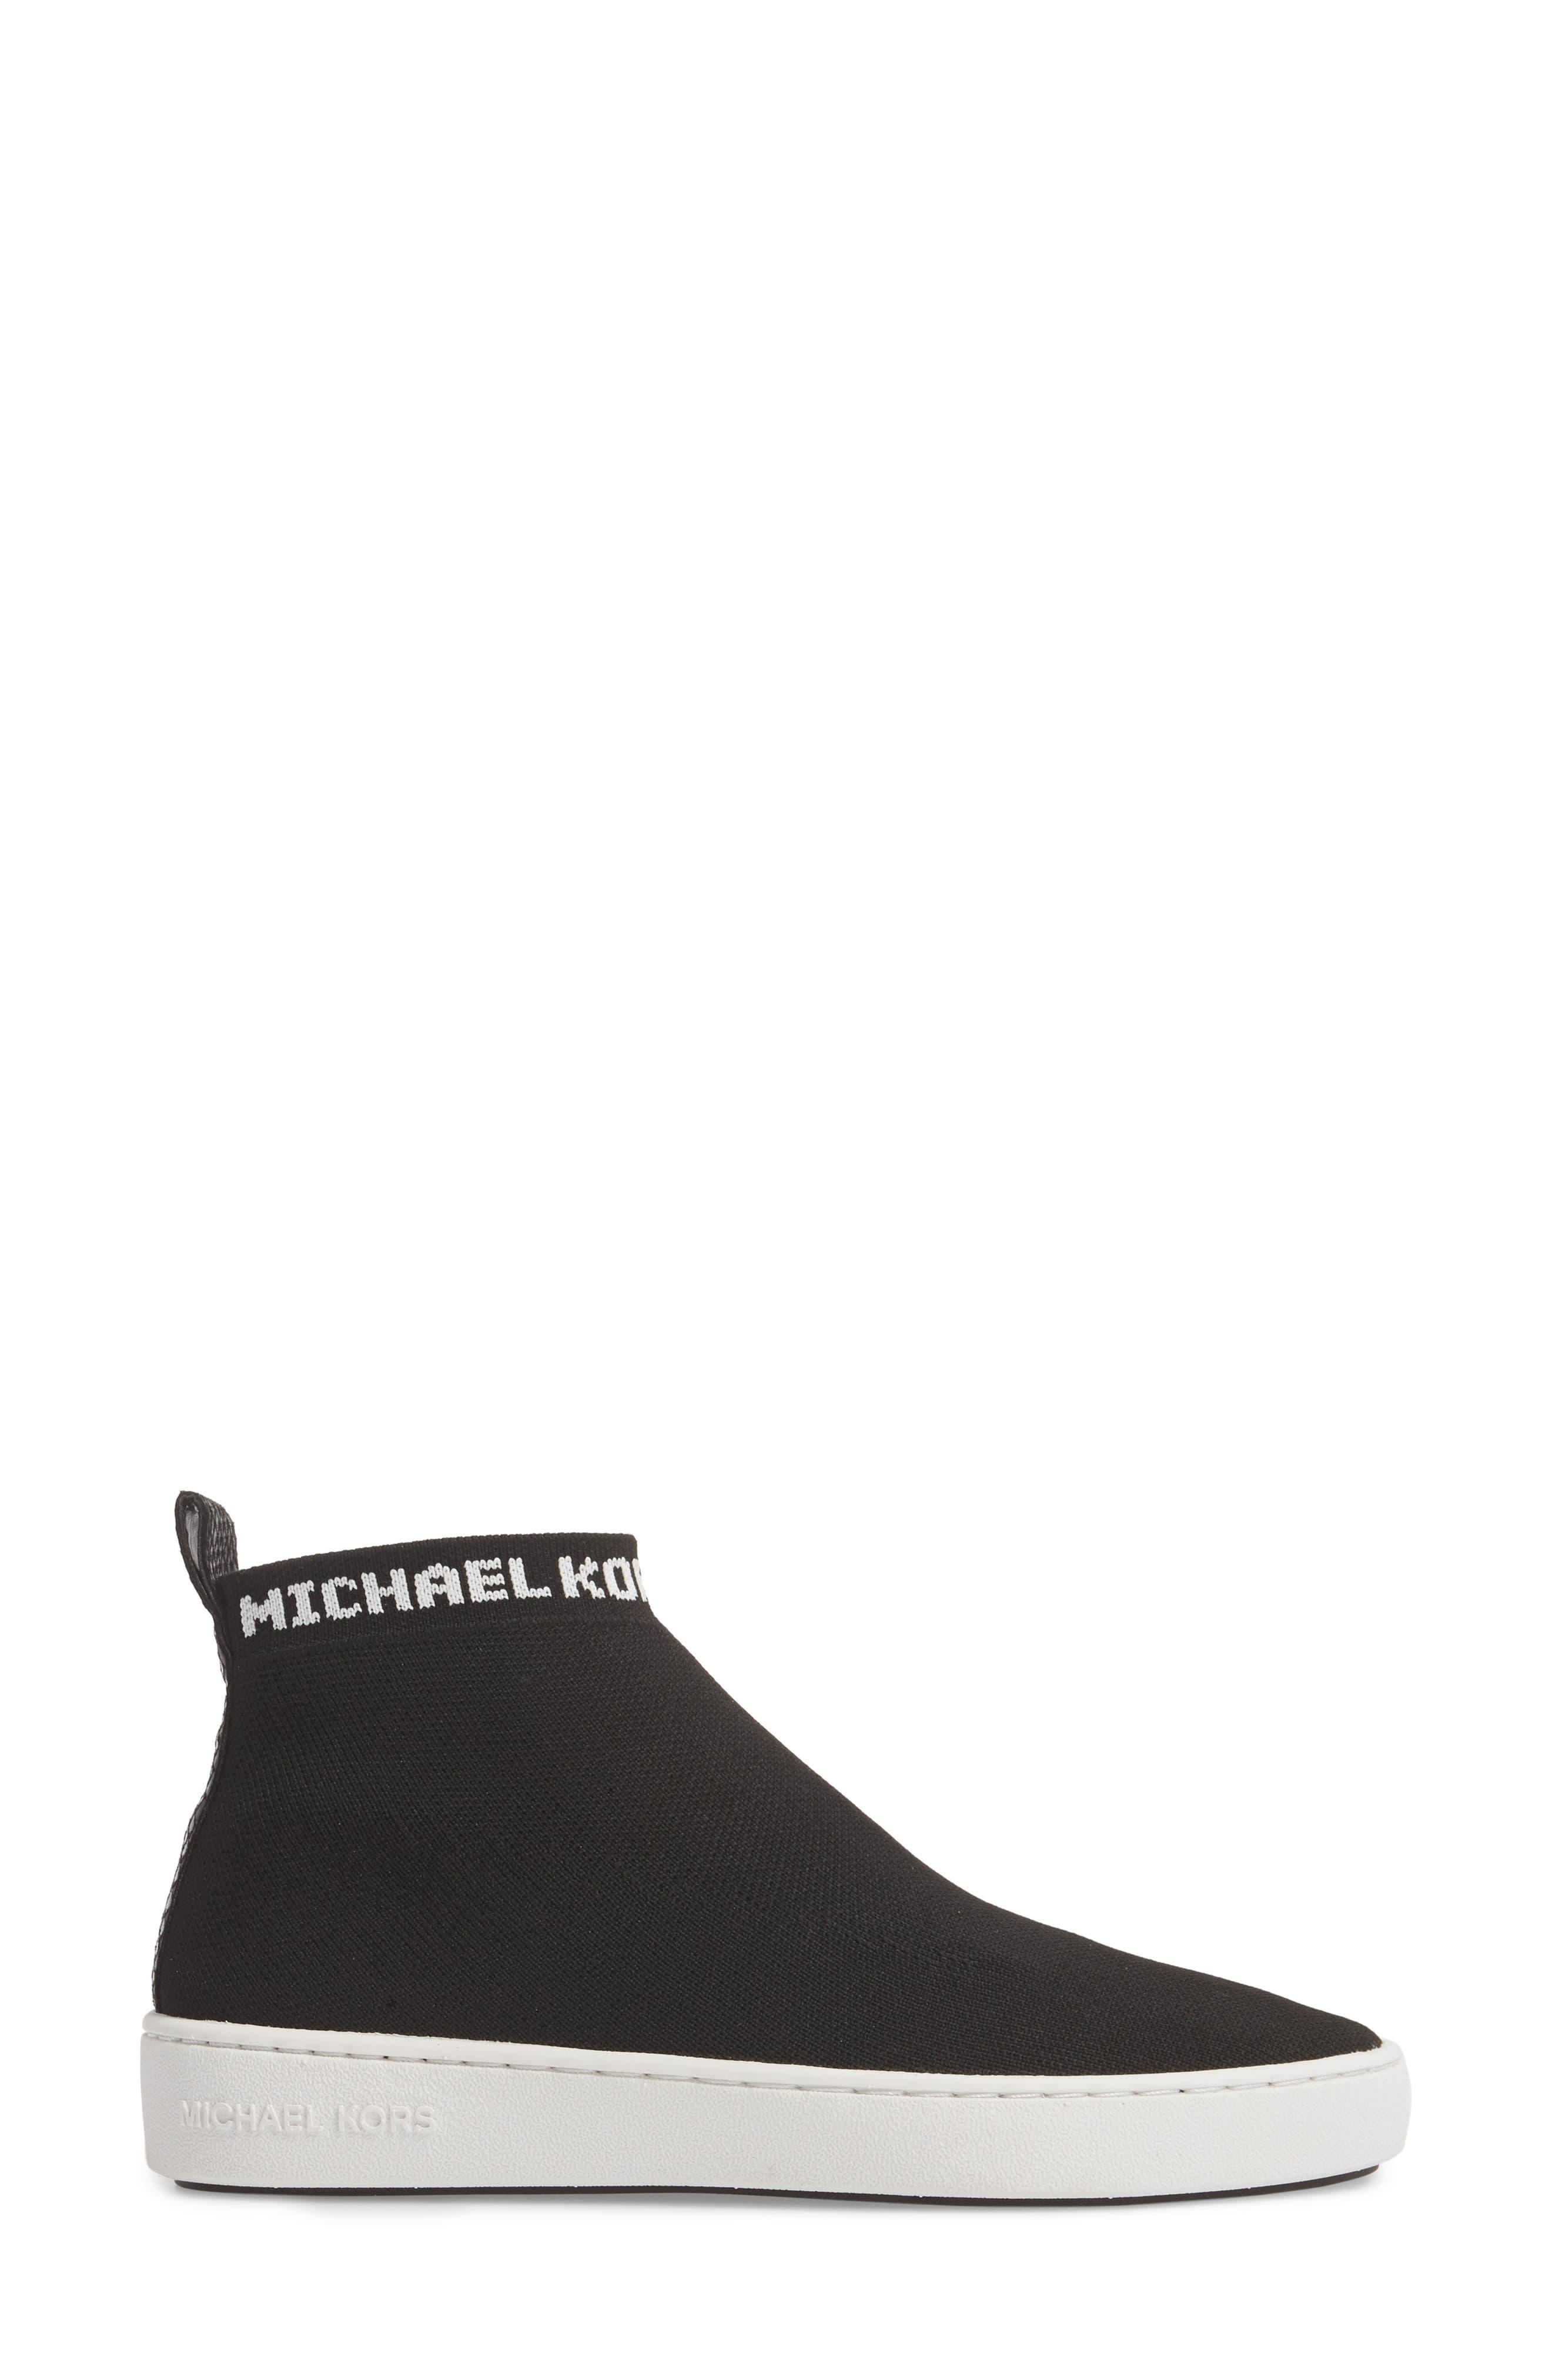 Hilda High Top Sock Sneaker,                             Alternate thumbnail 3, color,                             Black Knit Fabric